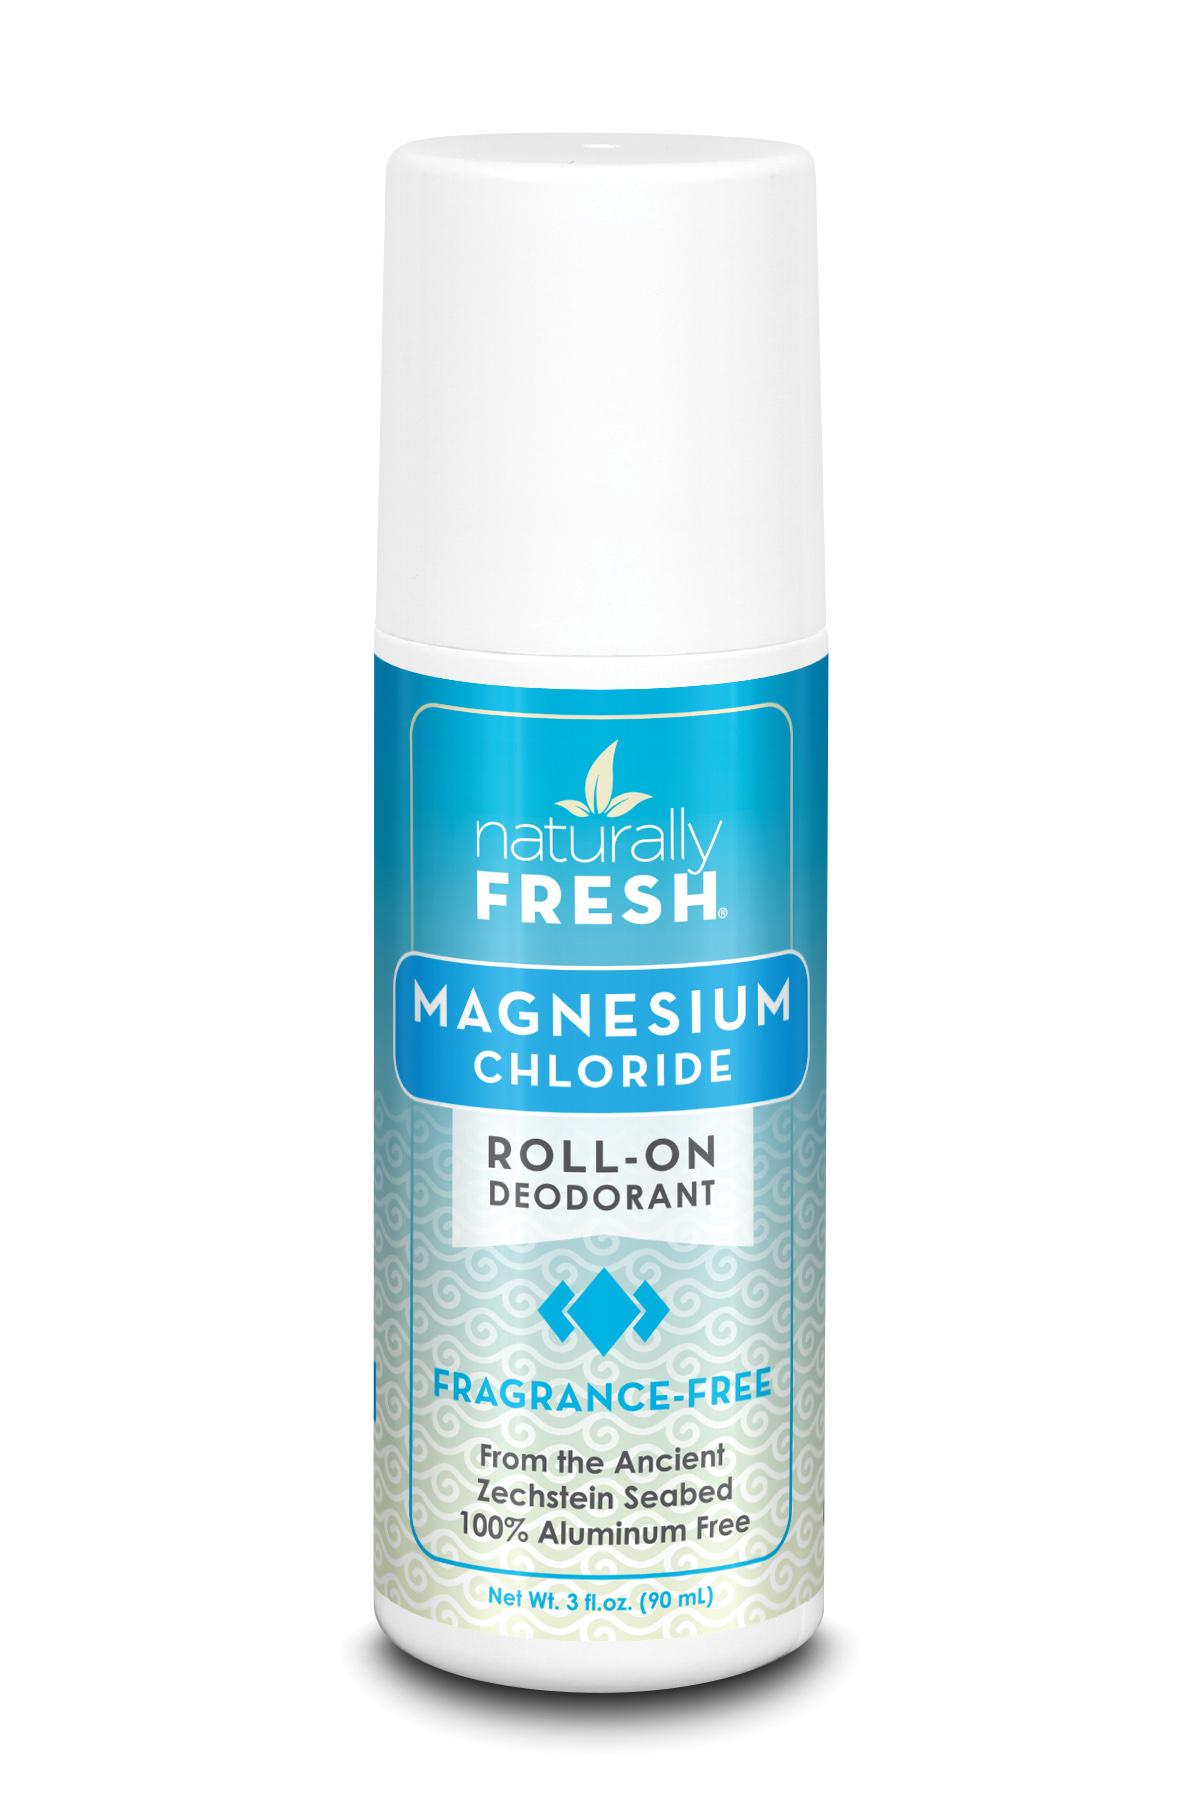 Magnesium Chloride Roll-On Deodorant Fragrance Free 90ml